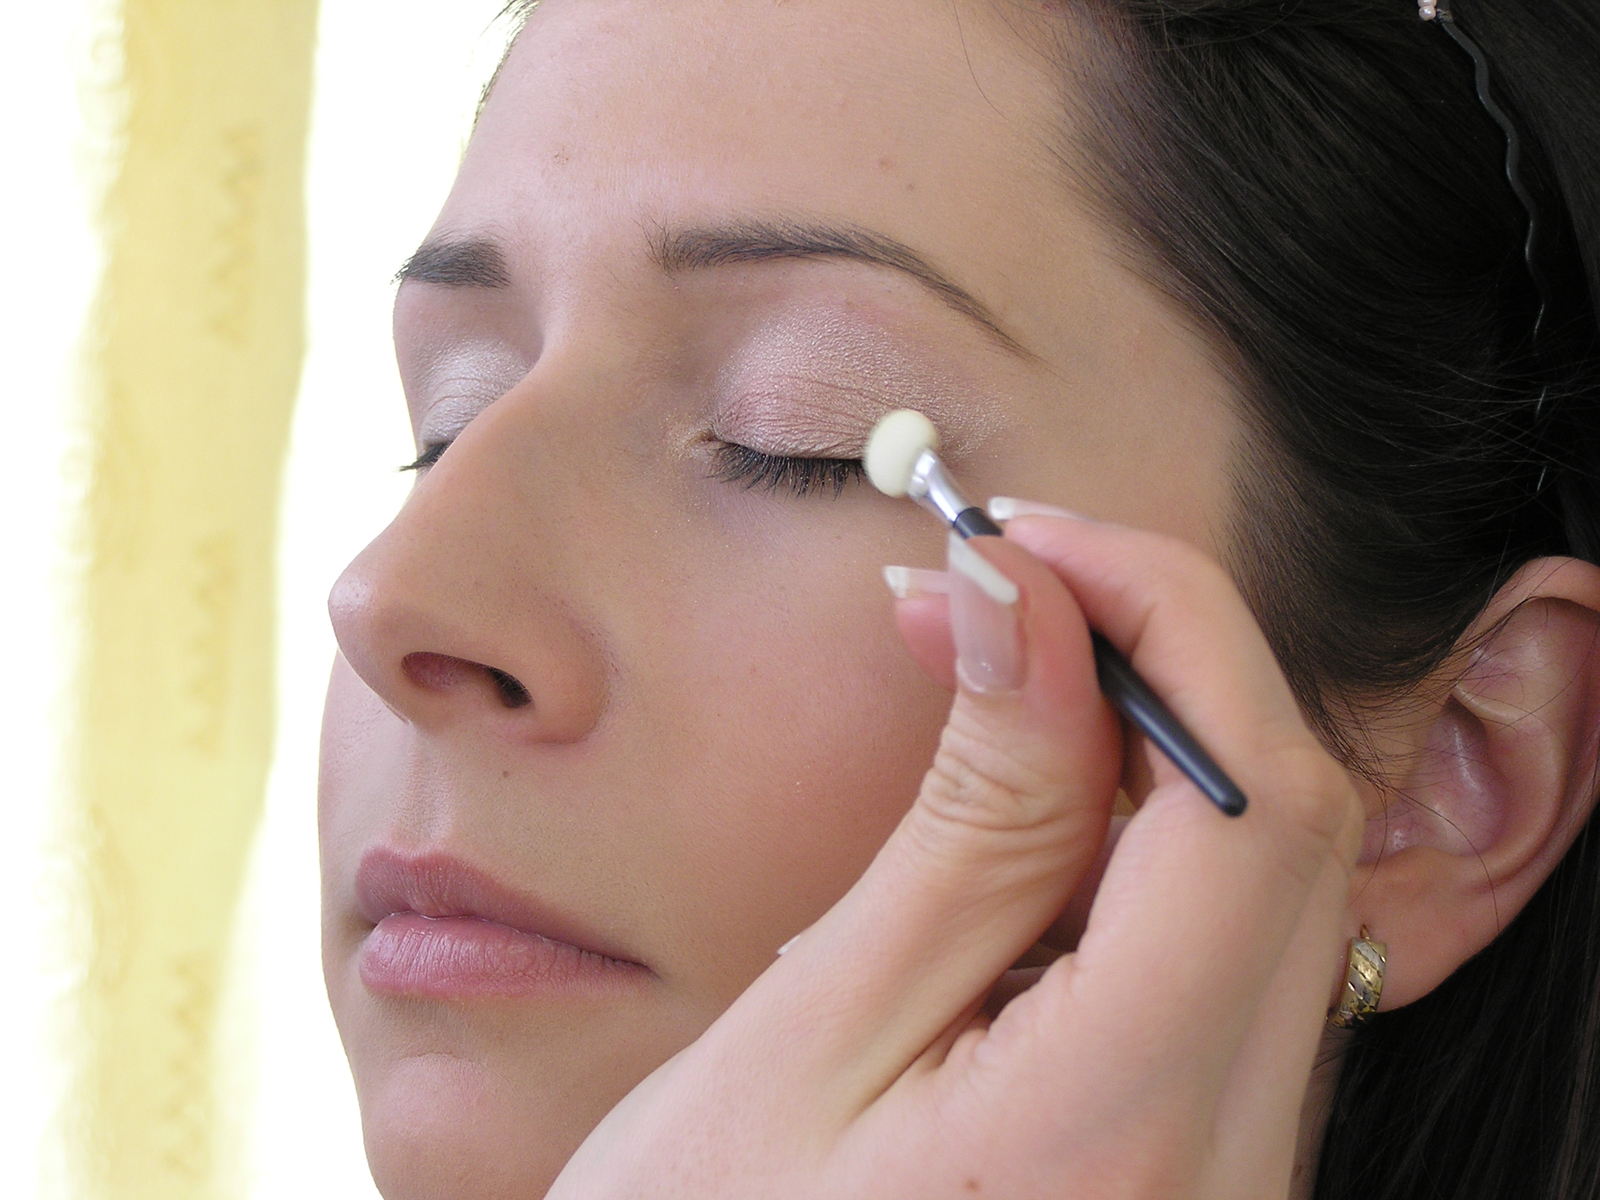 http://4.bp.blogspot.com/-cdOgGgcoKnU/Ti_meyAjUII/AAAAAAAAAMM/jOsnxdJlHM4/s1600/eye-makeup-girl-wallpaper.jpg